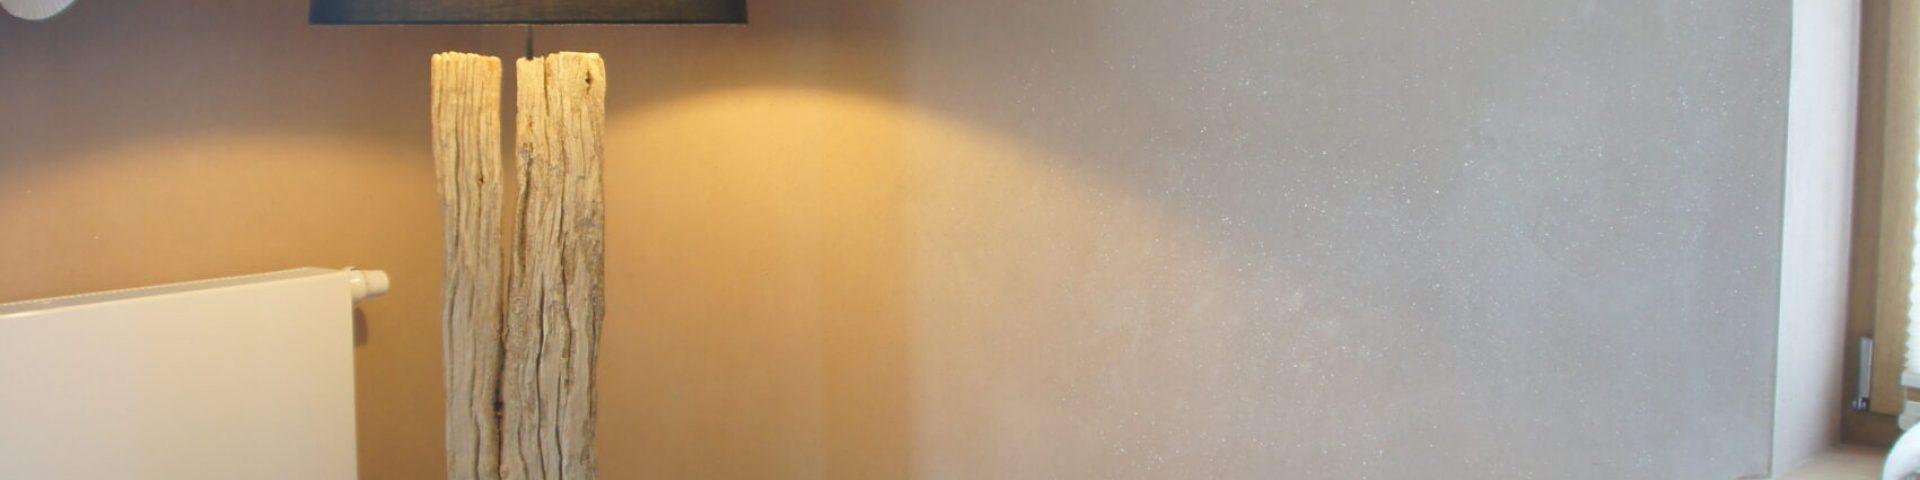 Hochwertige Innenraumgestaltung